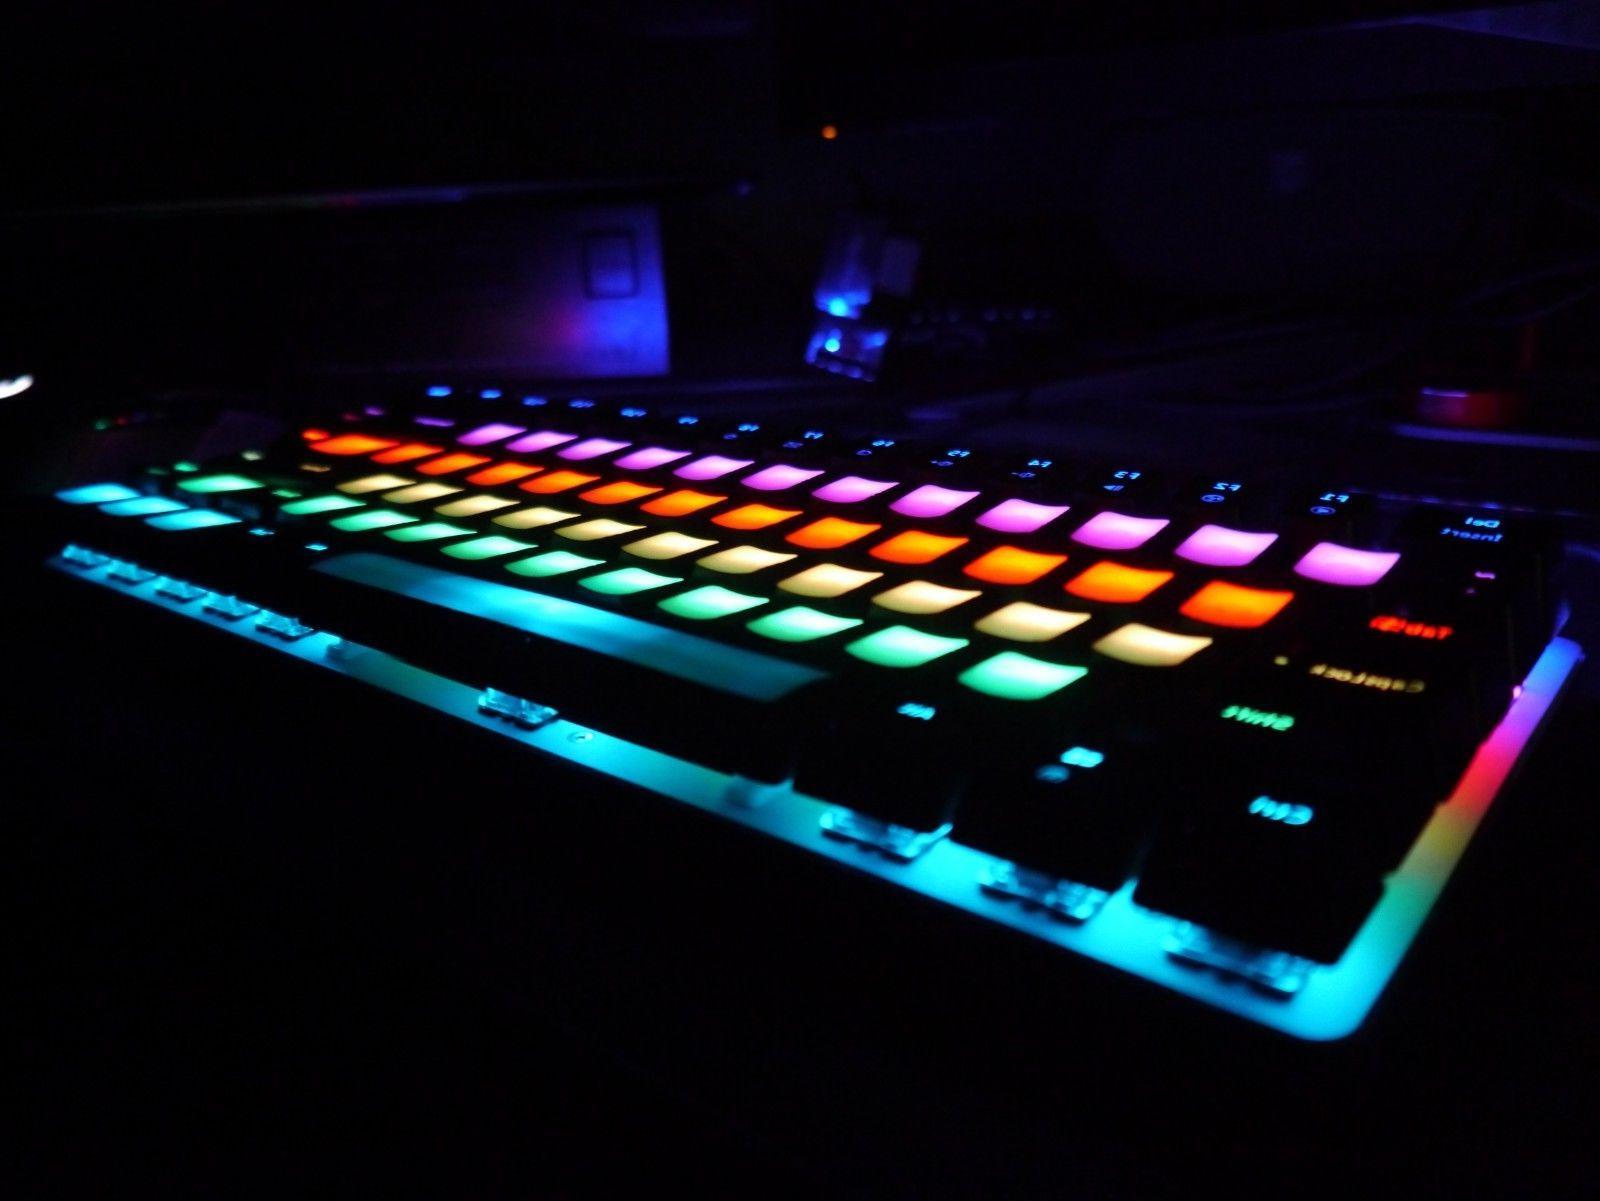 Ajazz Mech Keyboard 82 Keys, Blue Switches, Decals